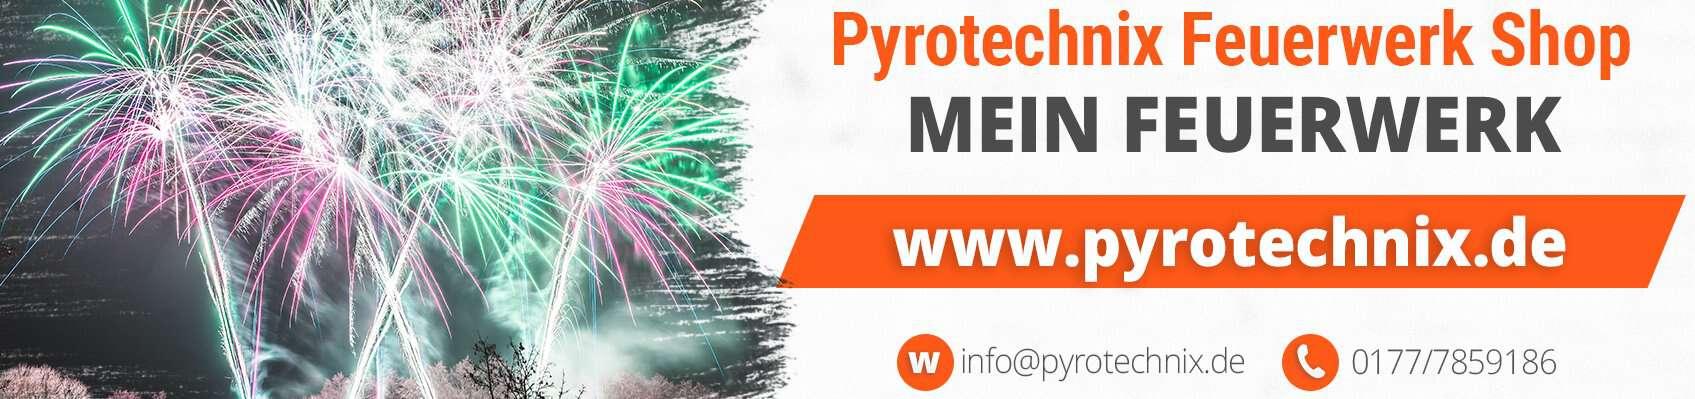 Pyrotechnix Feuerwerk Shop